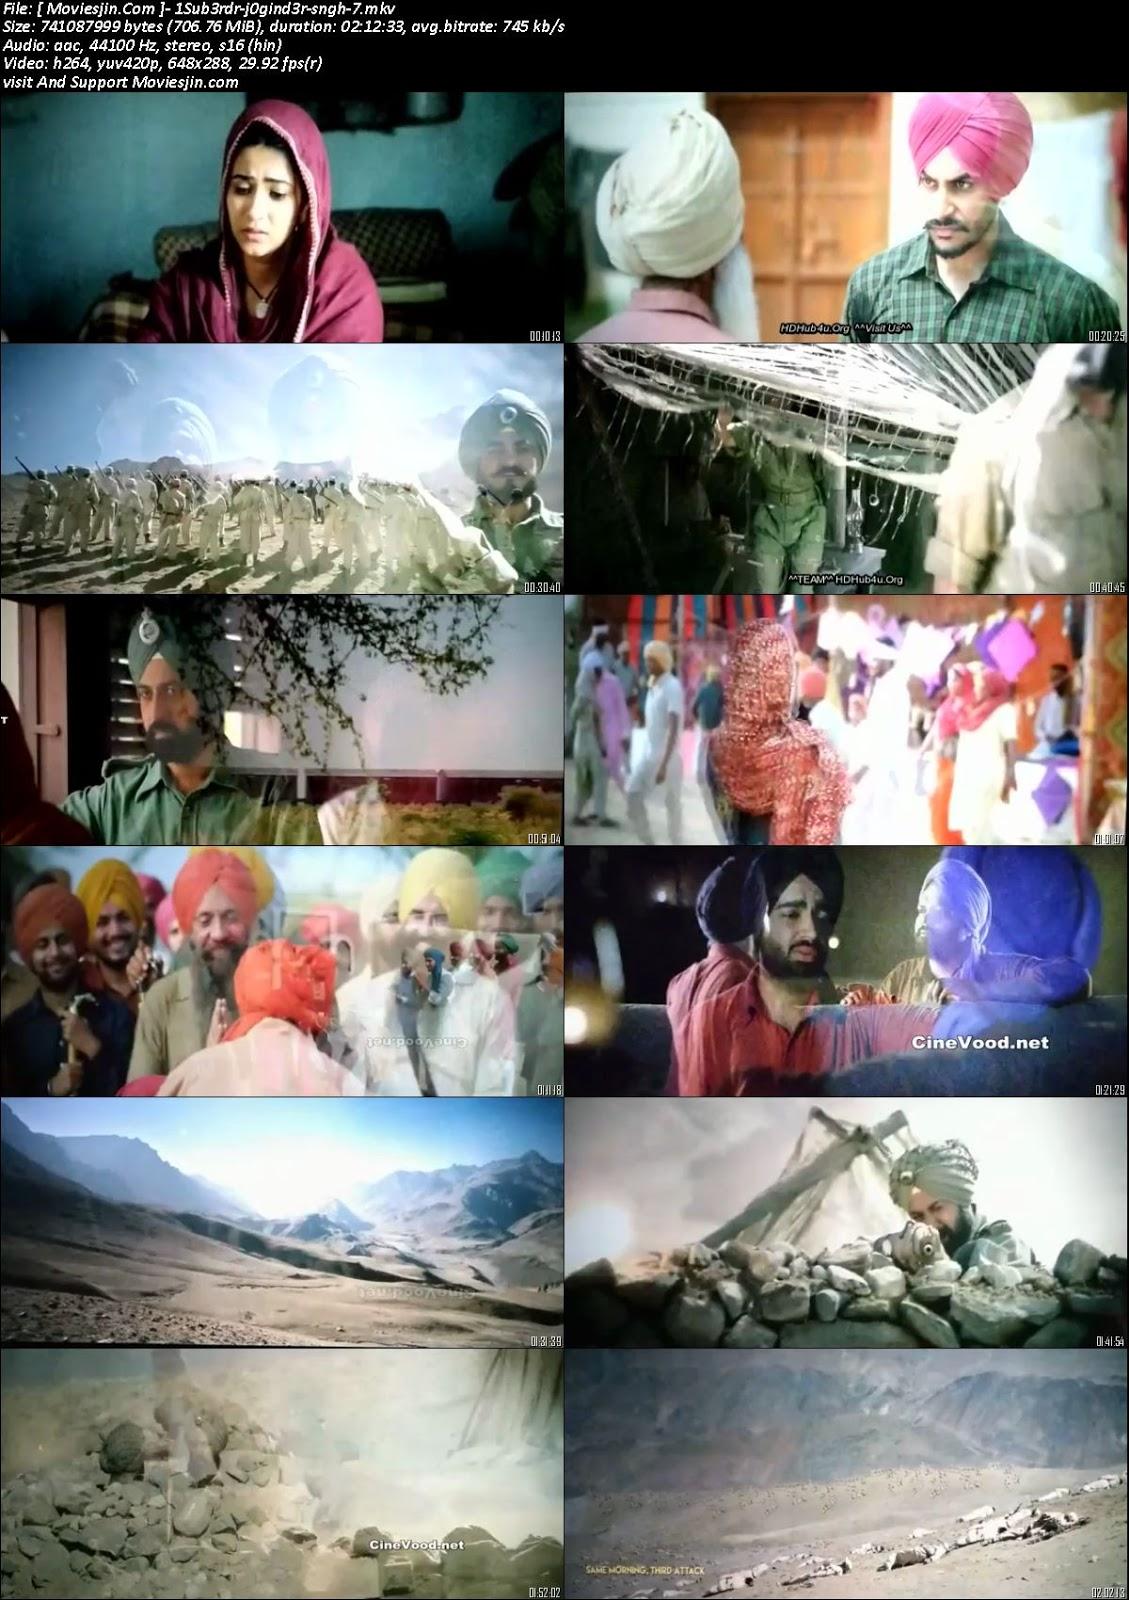 Watch Online Subedar Joginder Singh 2018 Punjabi DvD-Scr x264 350MB Full Movie Download Khatrimaza, free download 9xmovies,